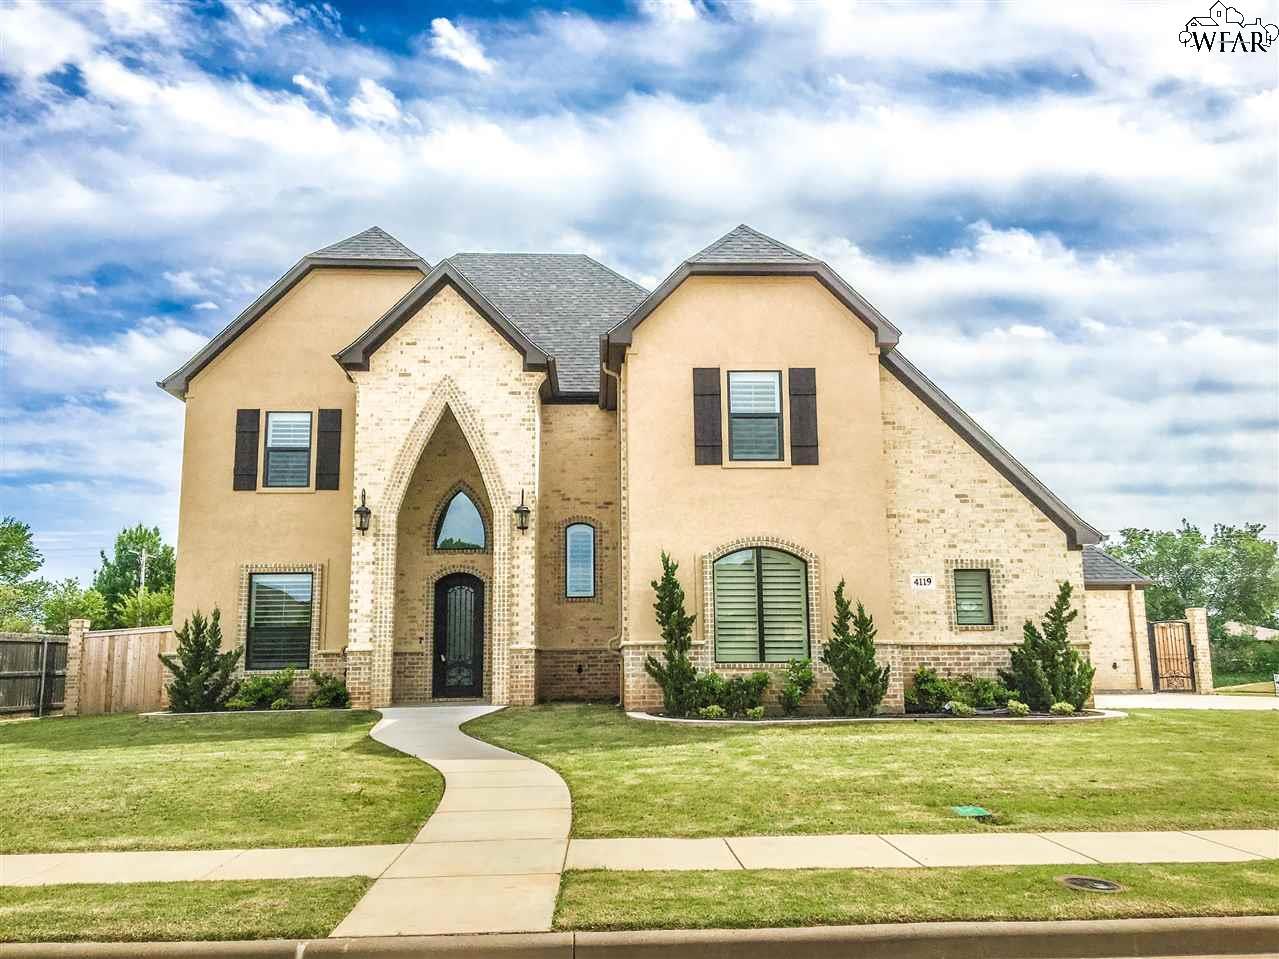 4119 SHADY GROVE LANE, Wichita Falls, TX 76308